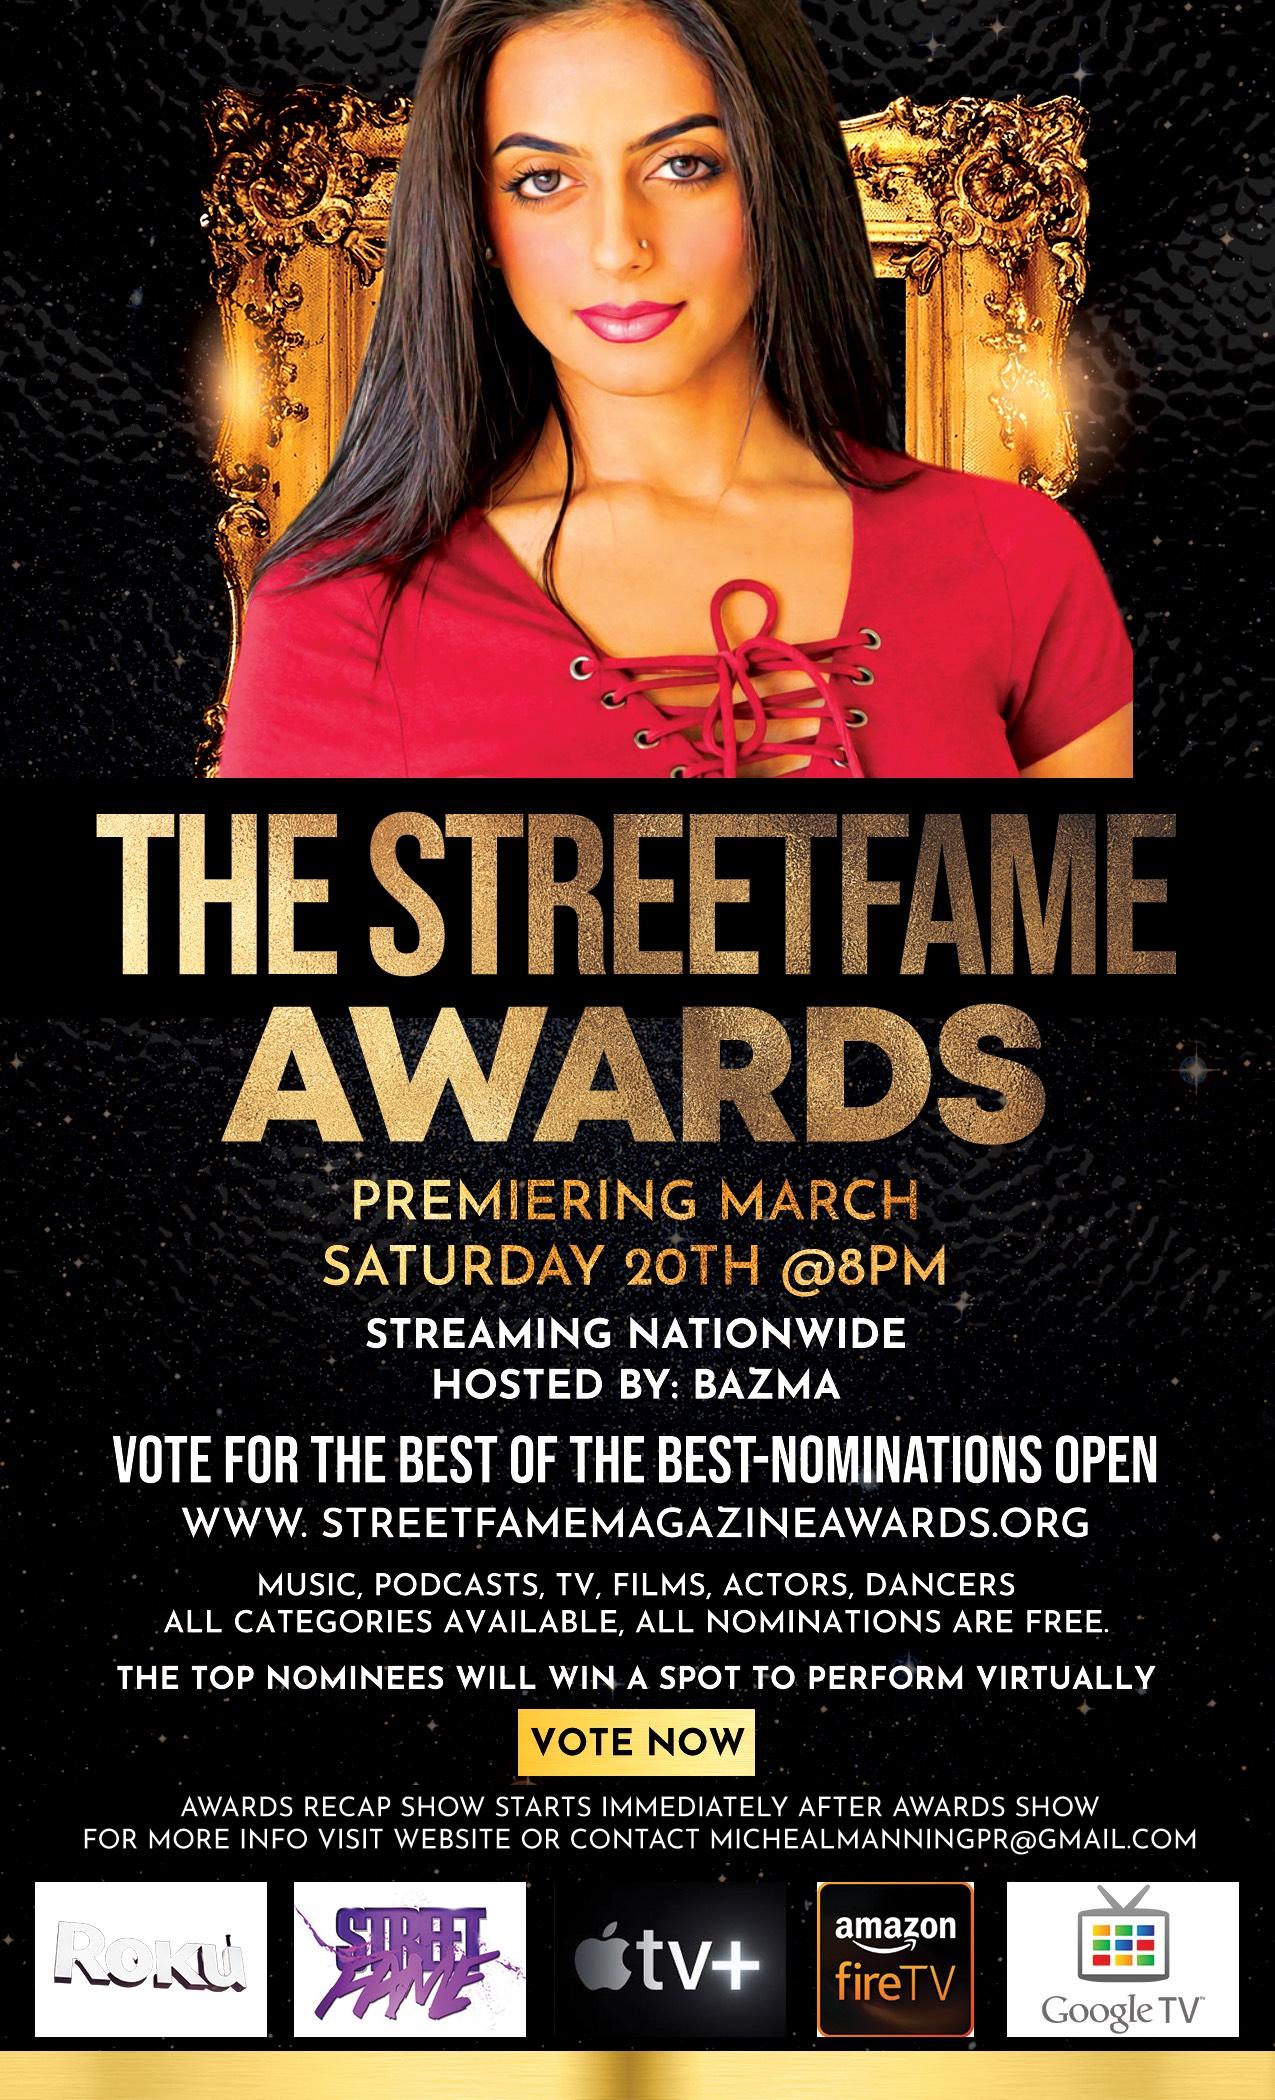 International Actress & Singer Bazma will host The First Annual Street Fame Awards Event!